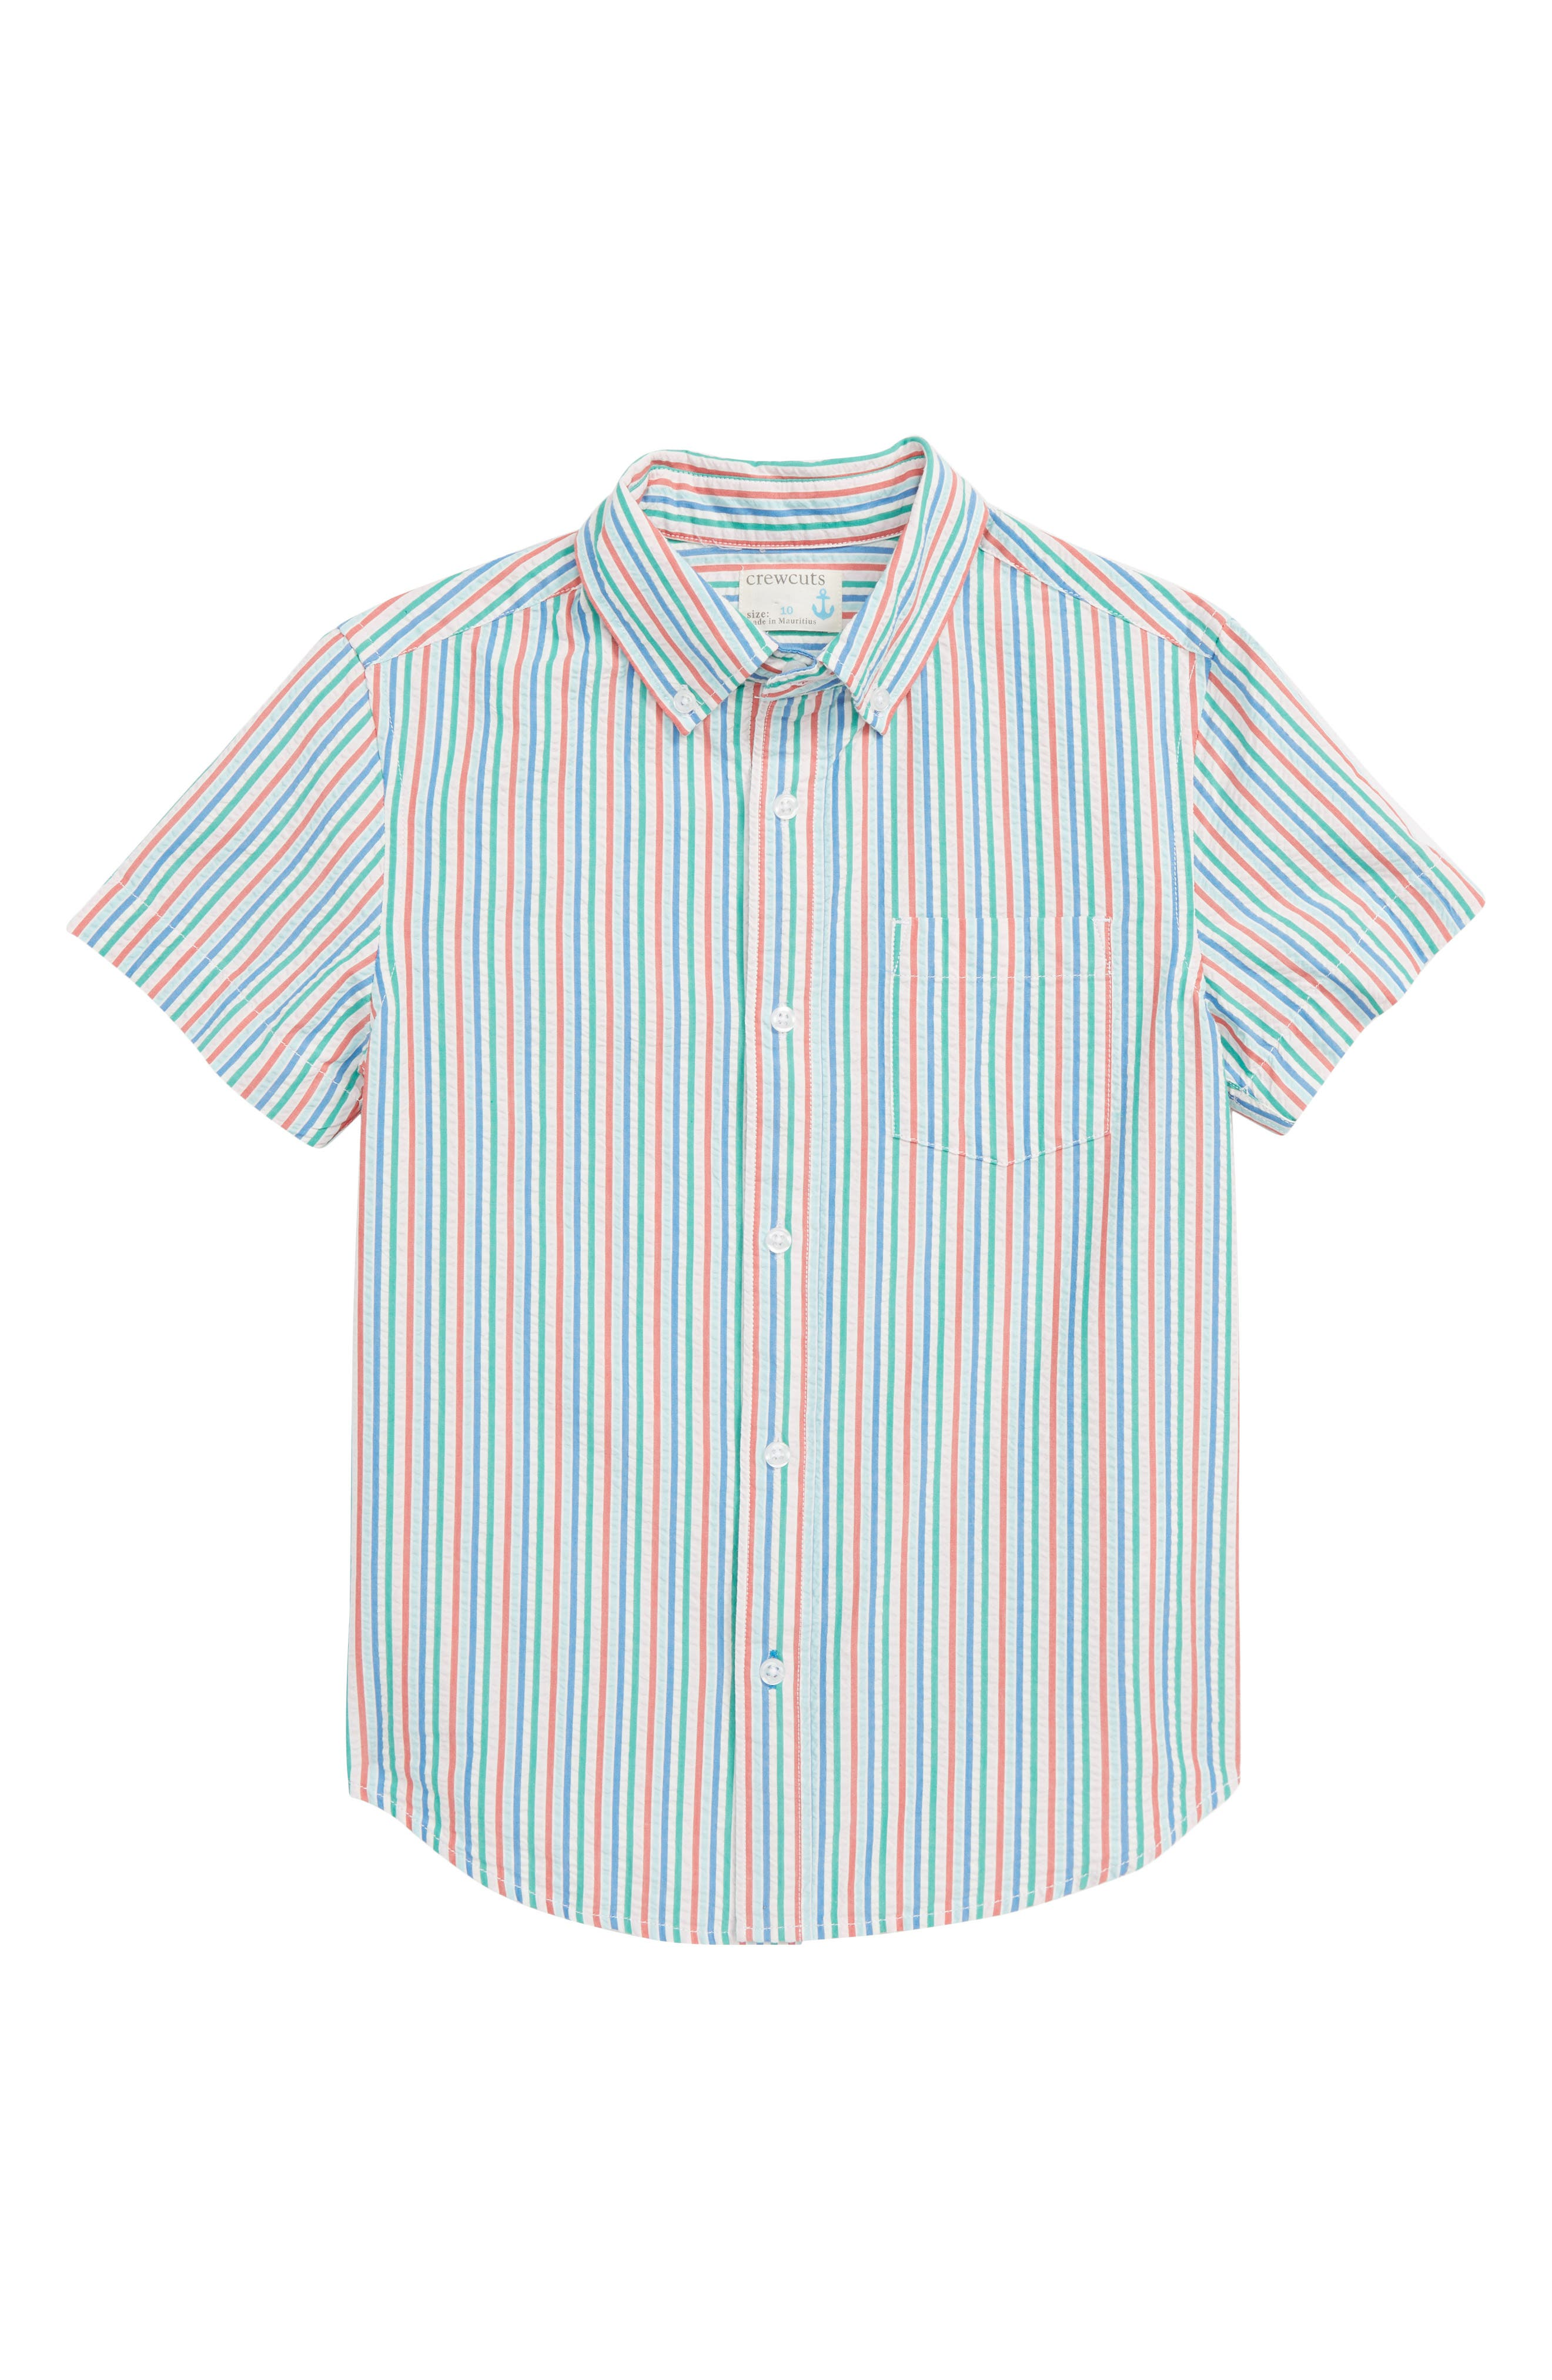 CREWCUTS BY J.CREW Seersucker Shirt, Main, color, MAR VISTA IVORY MULTI